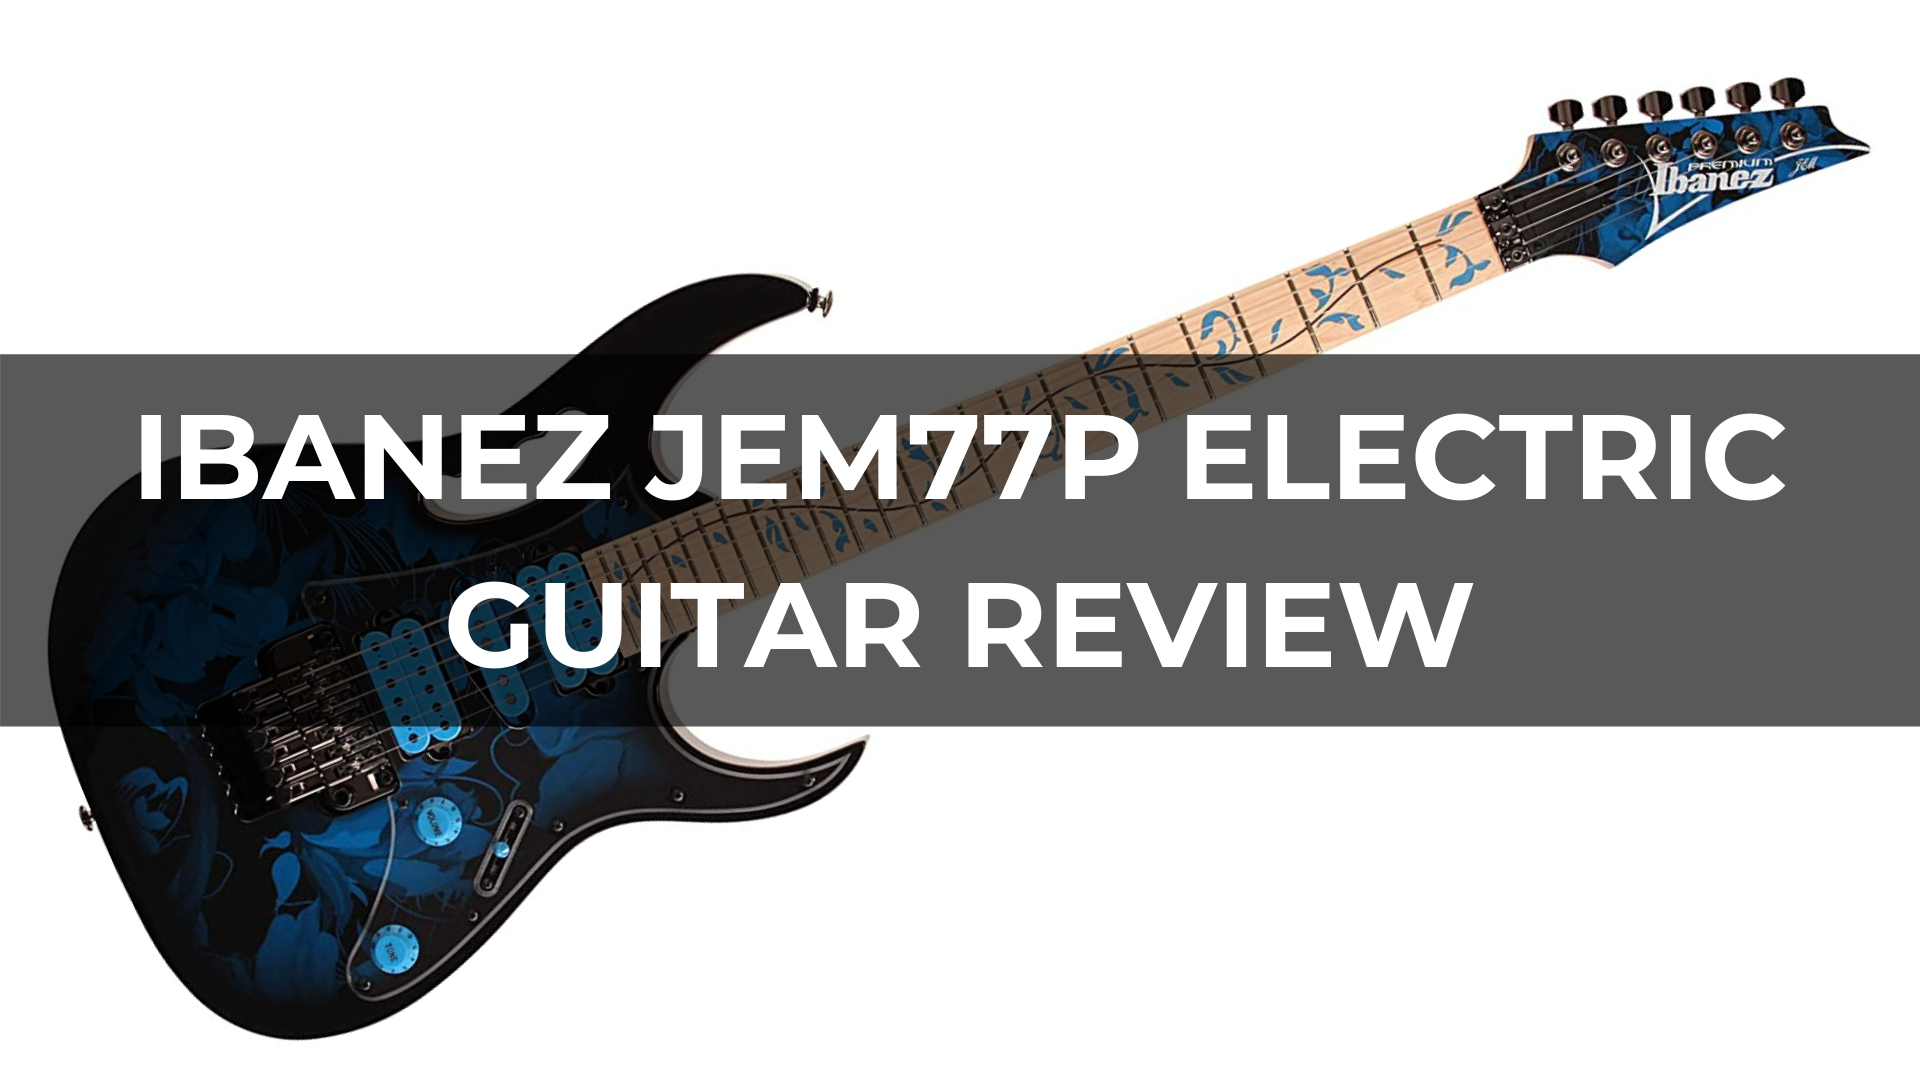 Ibanez JEM77P Electric Guitar Review